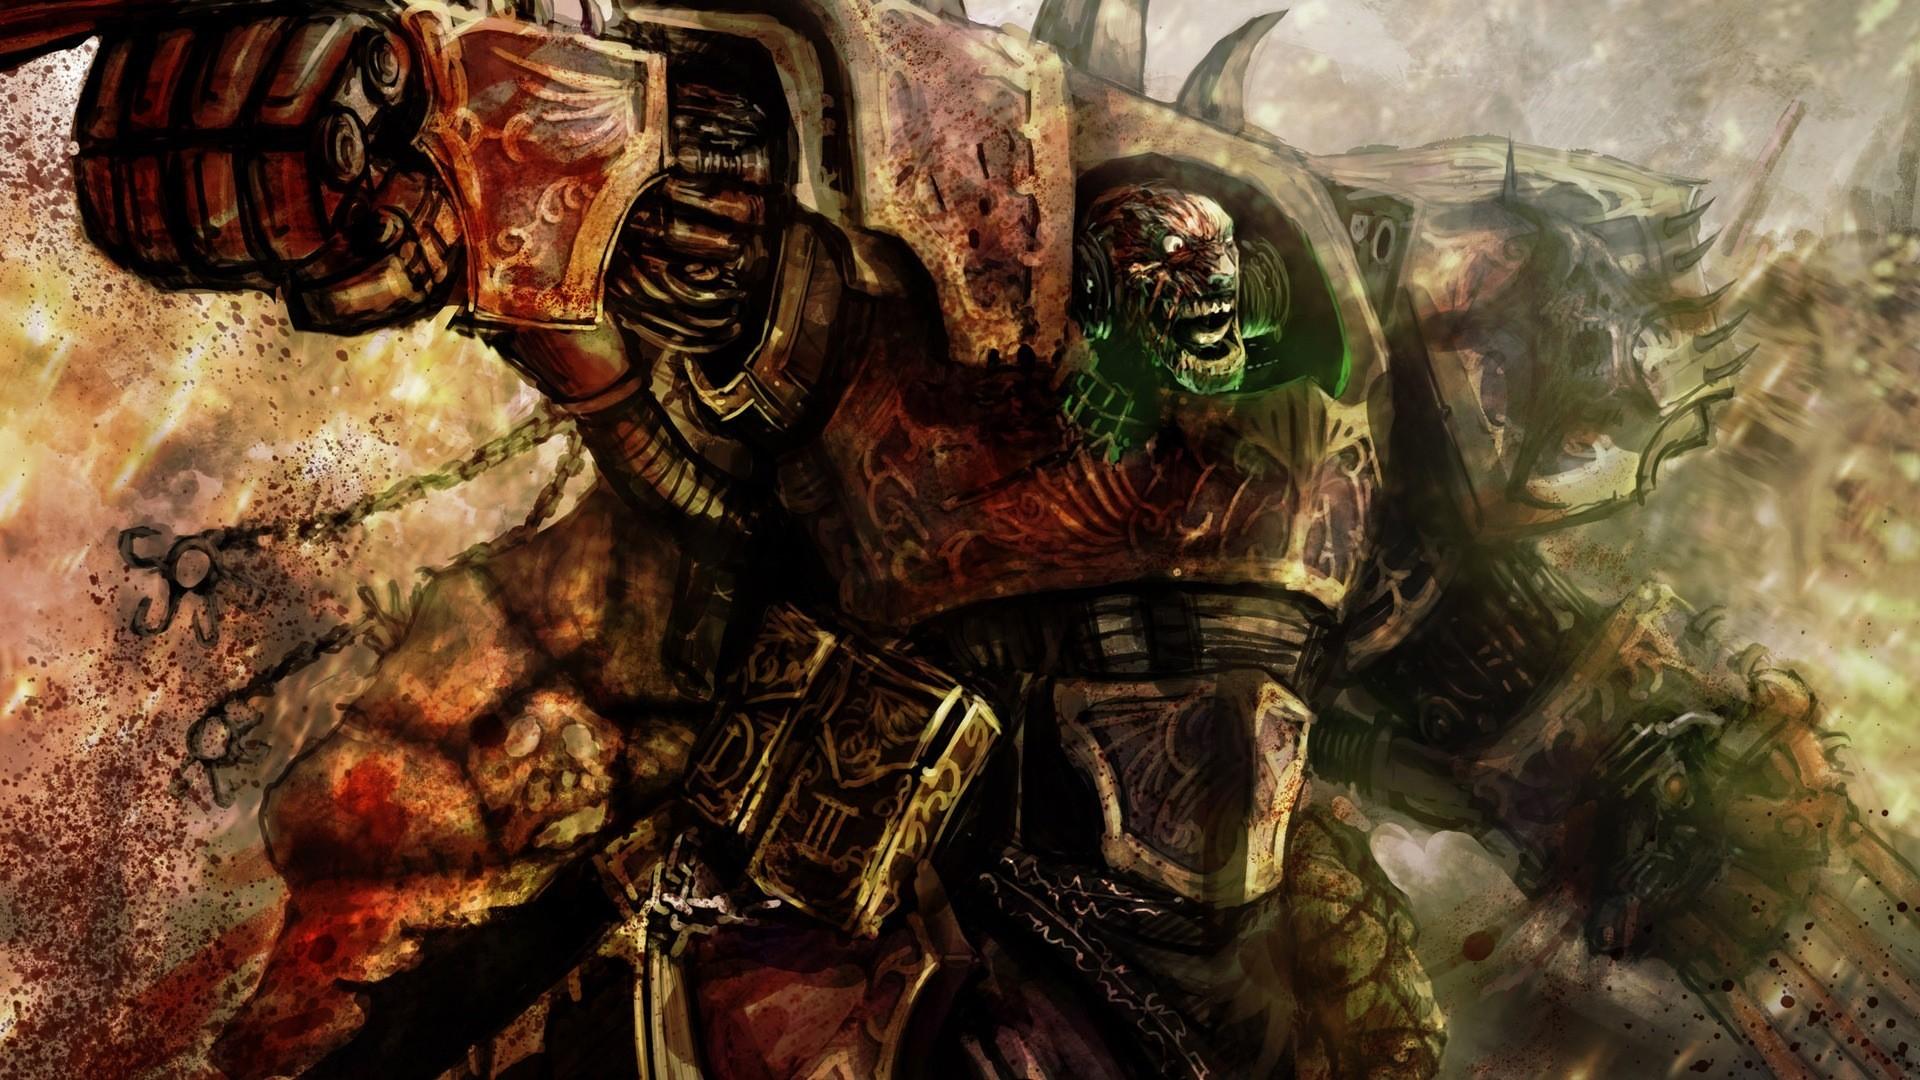 Artwork chaos space marine Warhammer 40k wallpaper | .